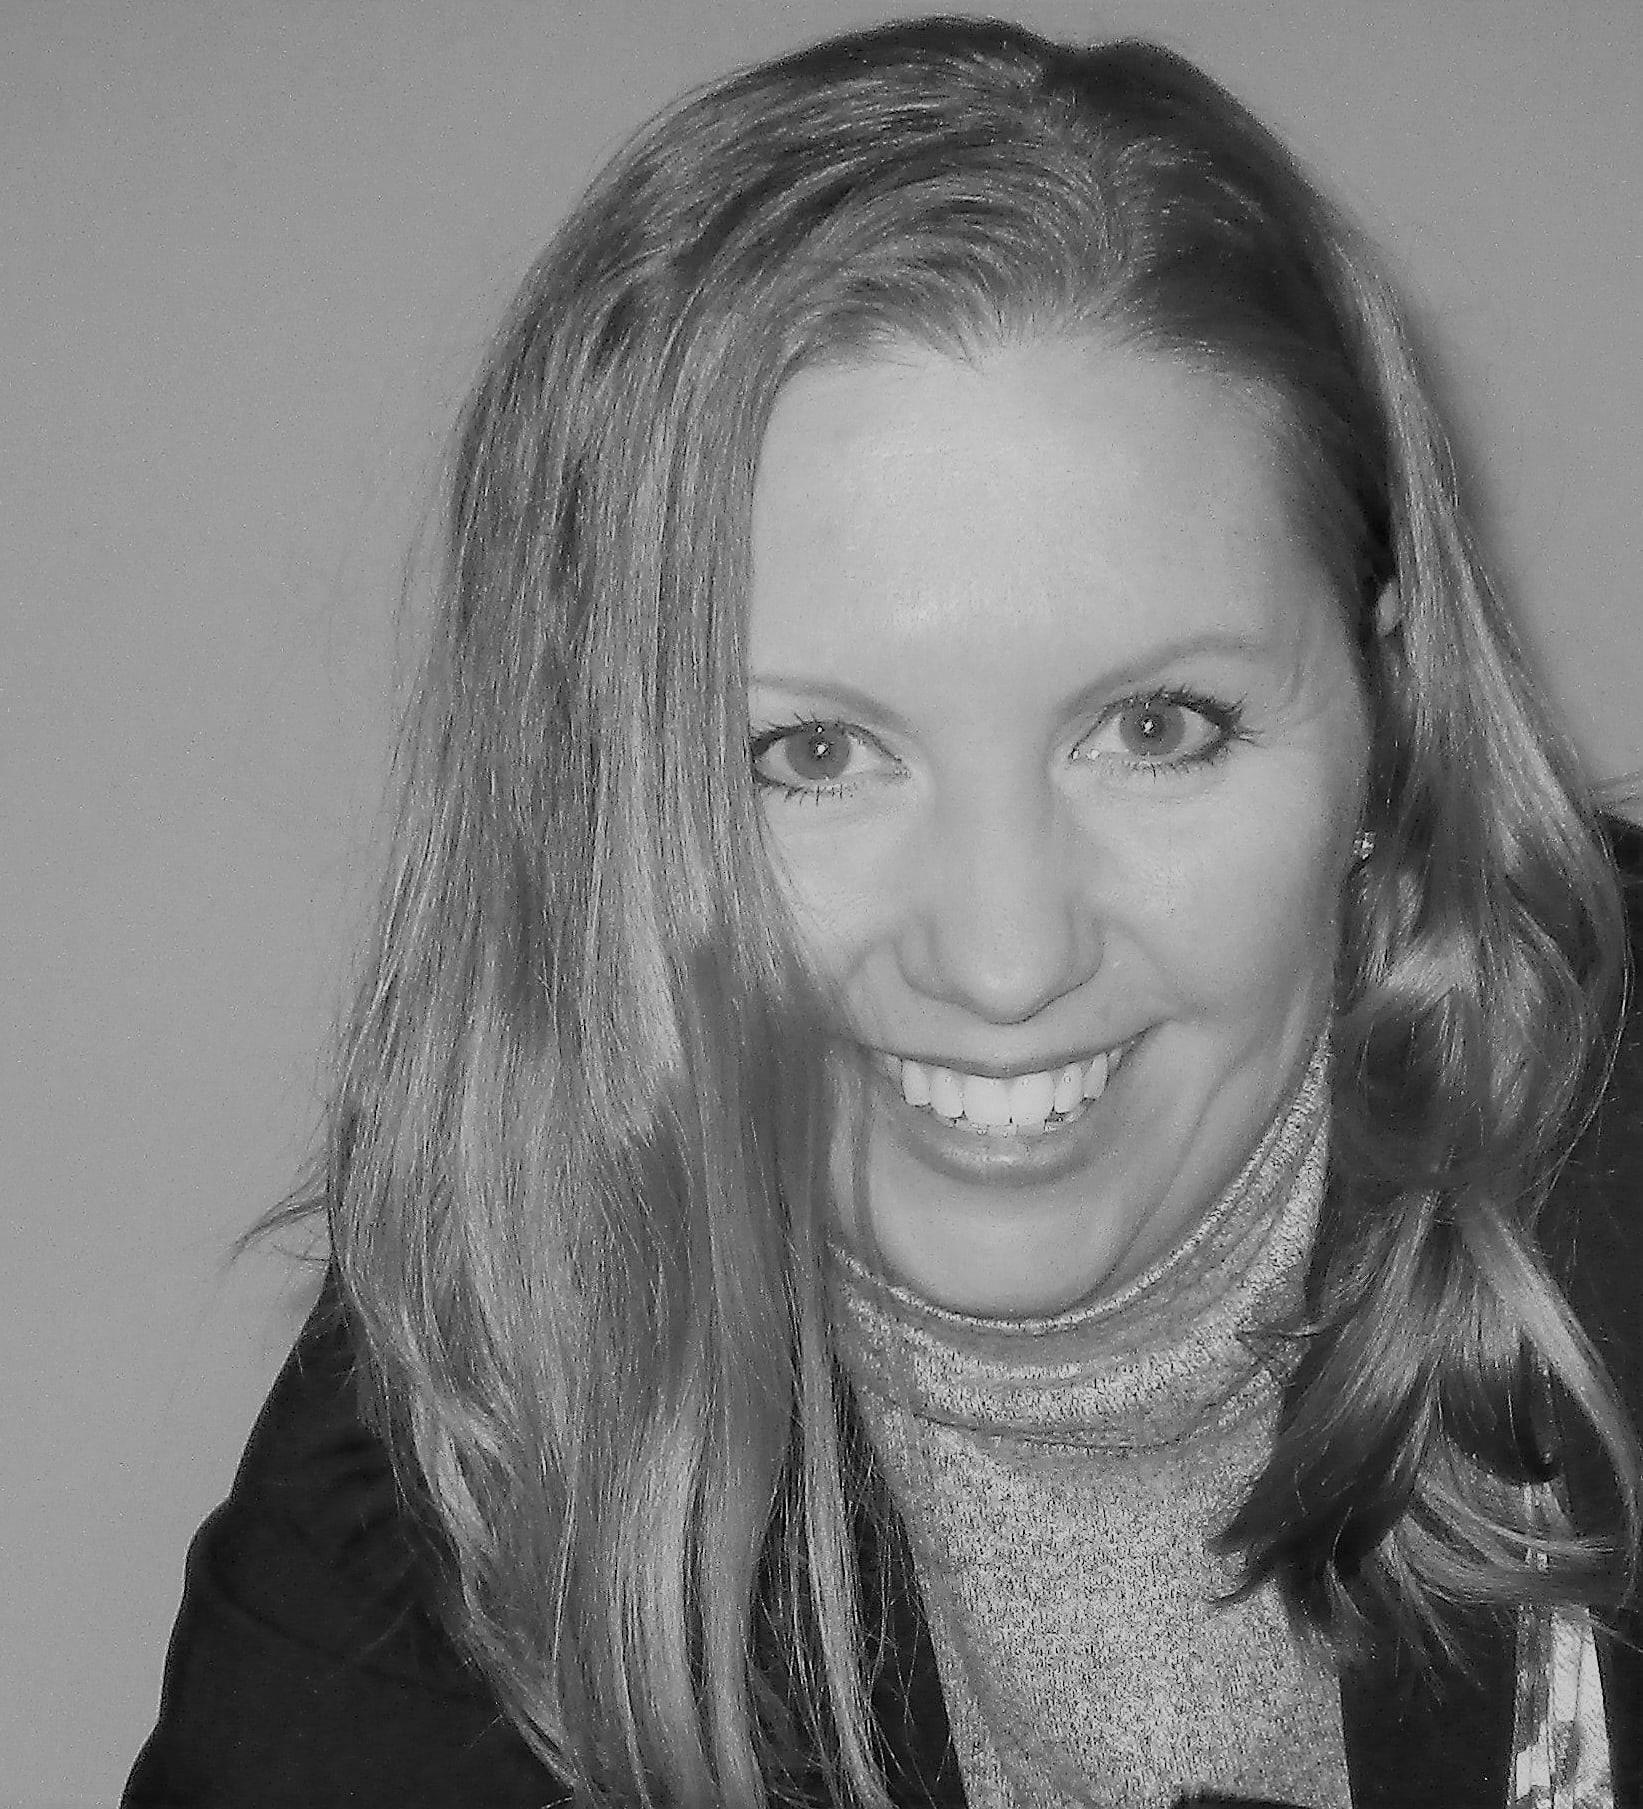 Introducing NARI Charlotte's Executive Director, Mara Esser!